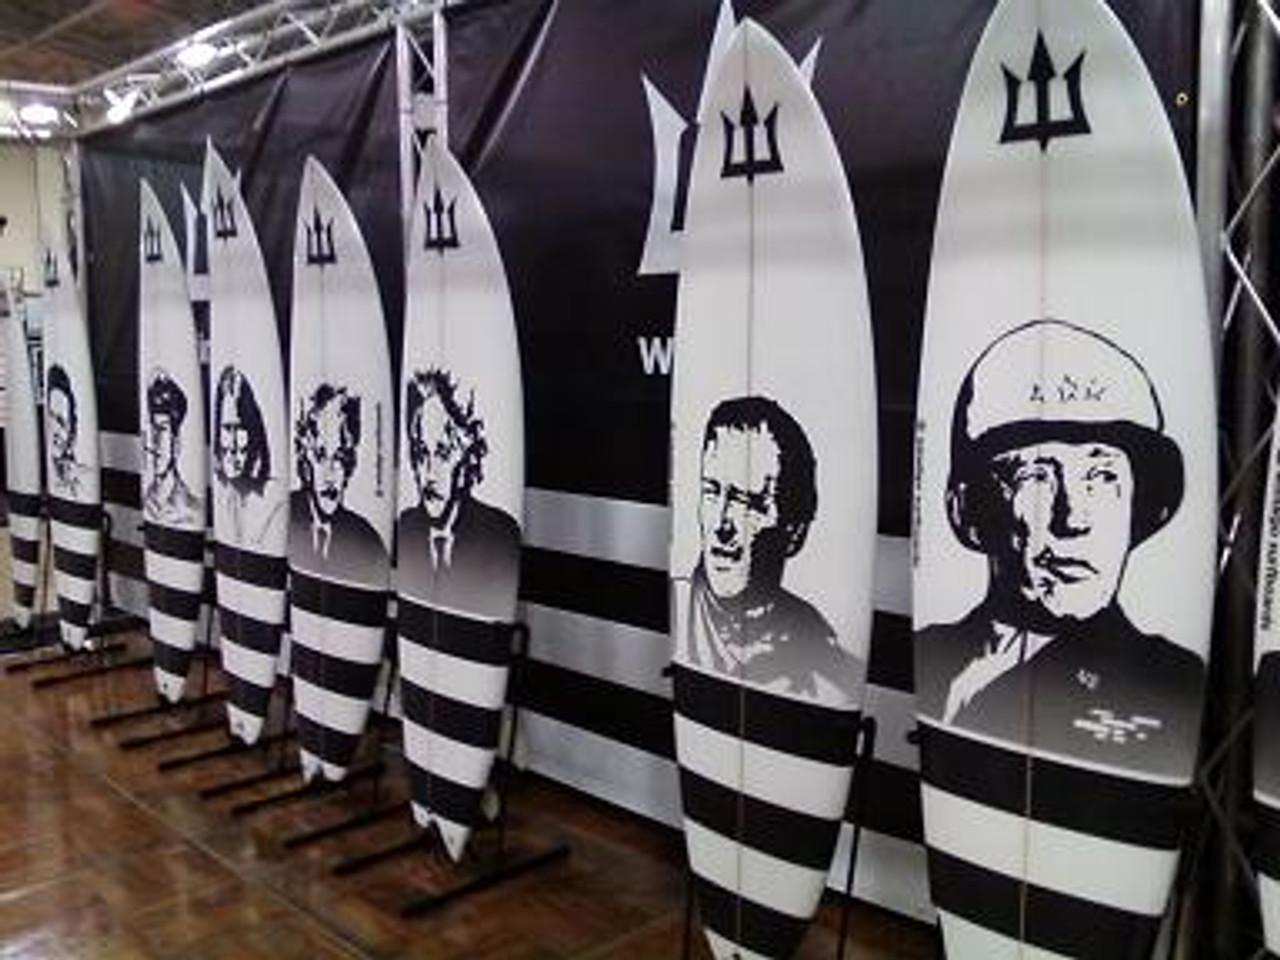 surfboard rack that displays the board art